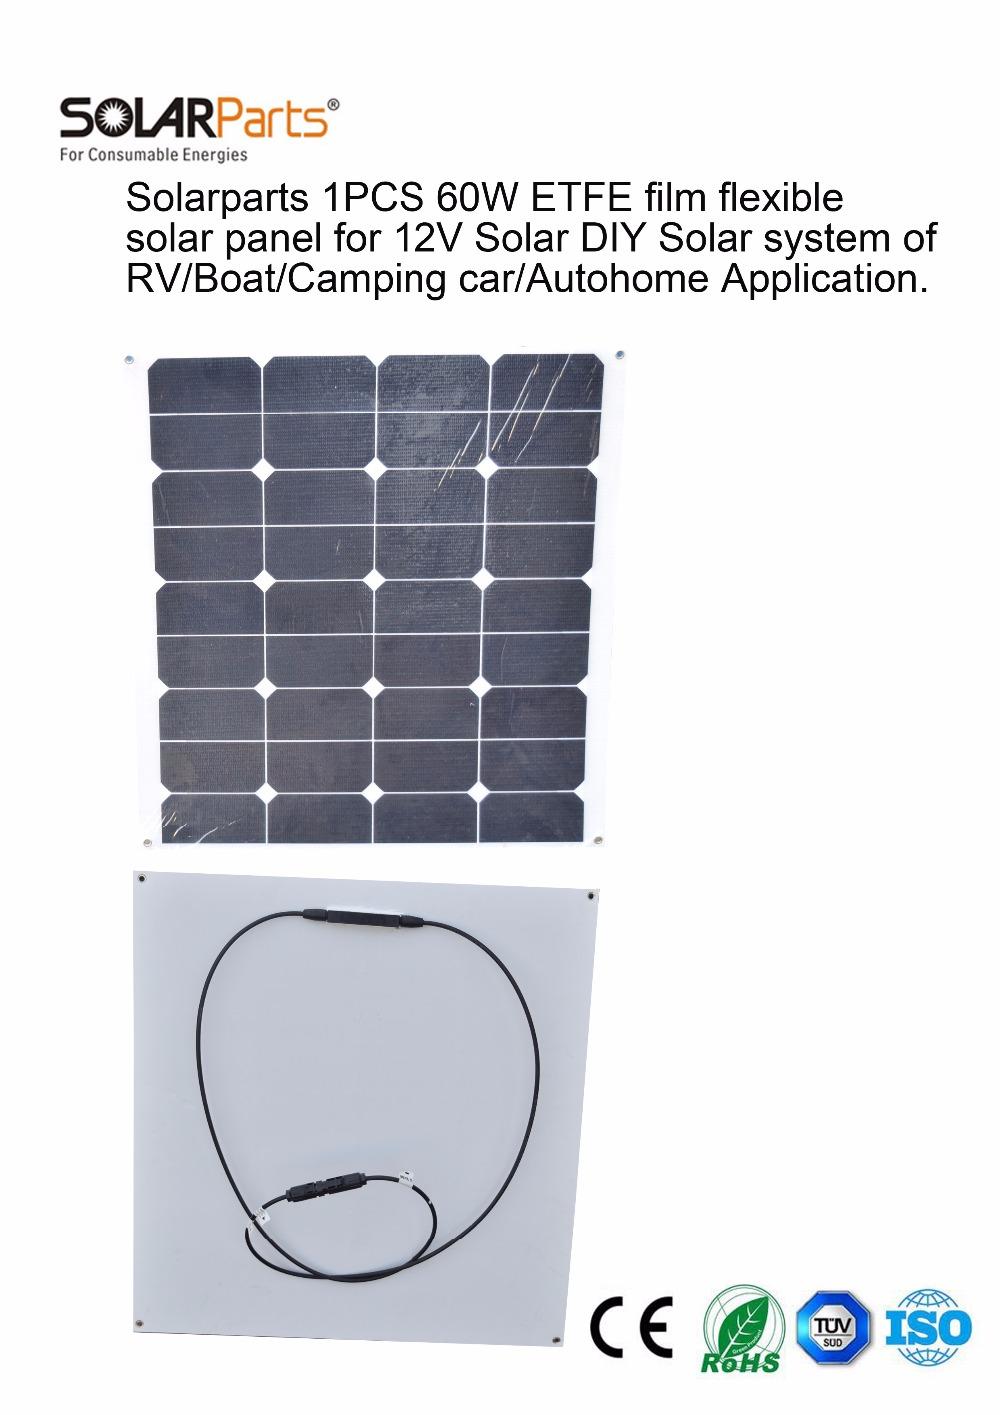 Solarparts 1x 60W ETFE film flexible solar panel 12V solar system solar cell marine yacht boat RV solar module for battery cheap(China (Mainland))